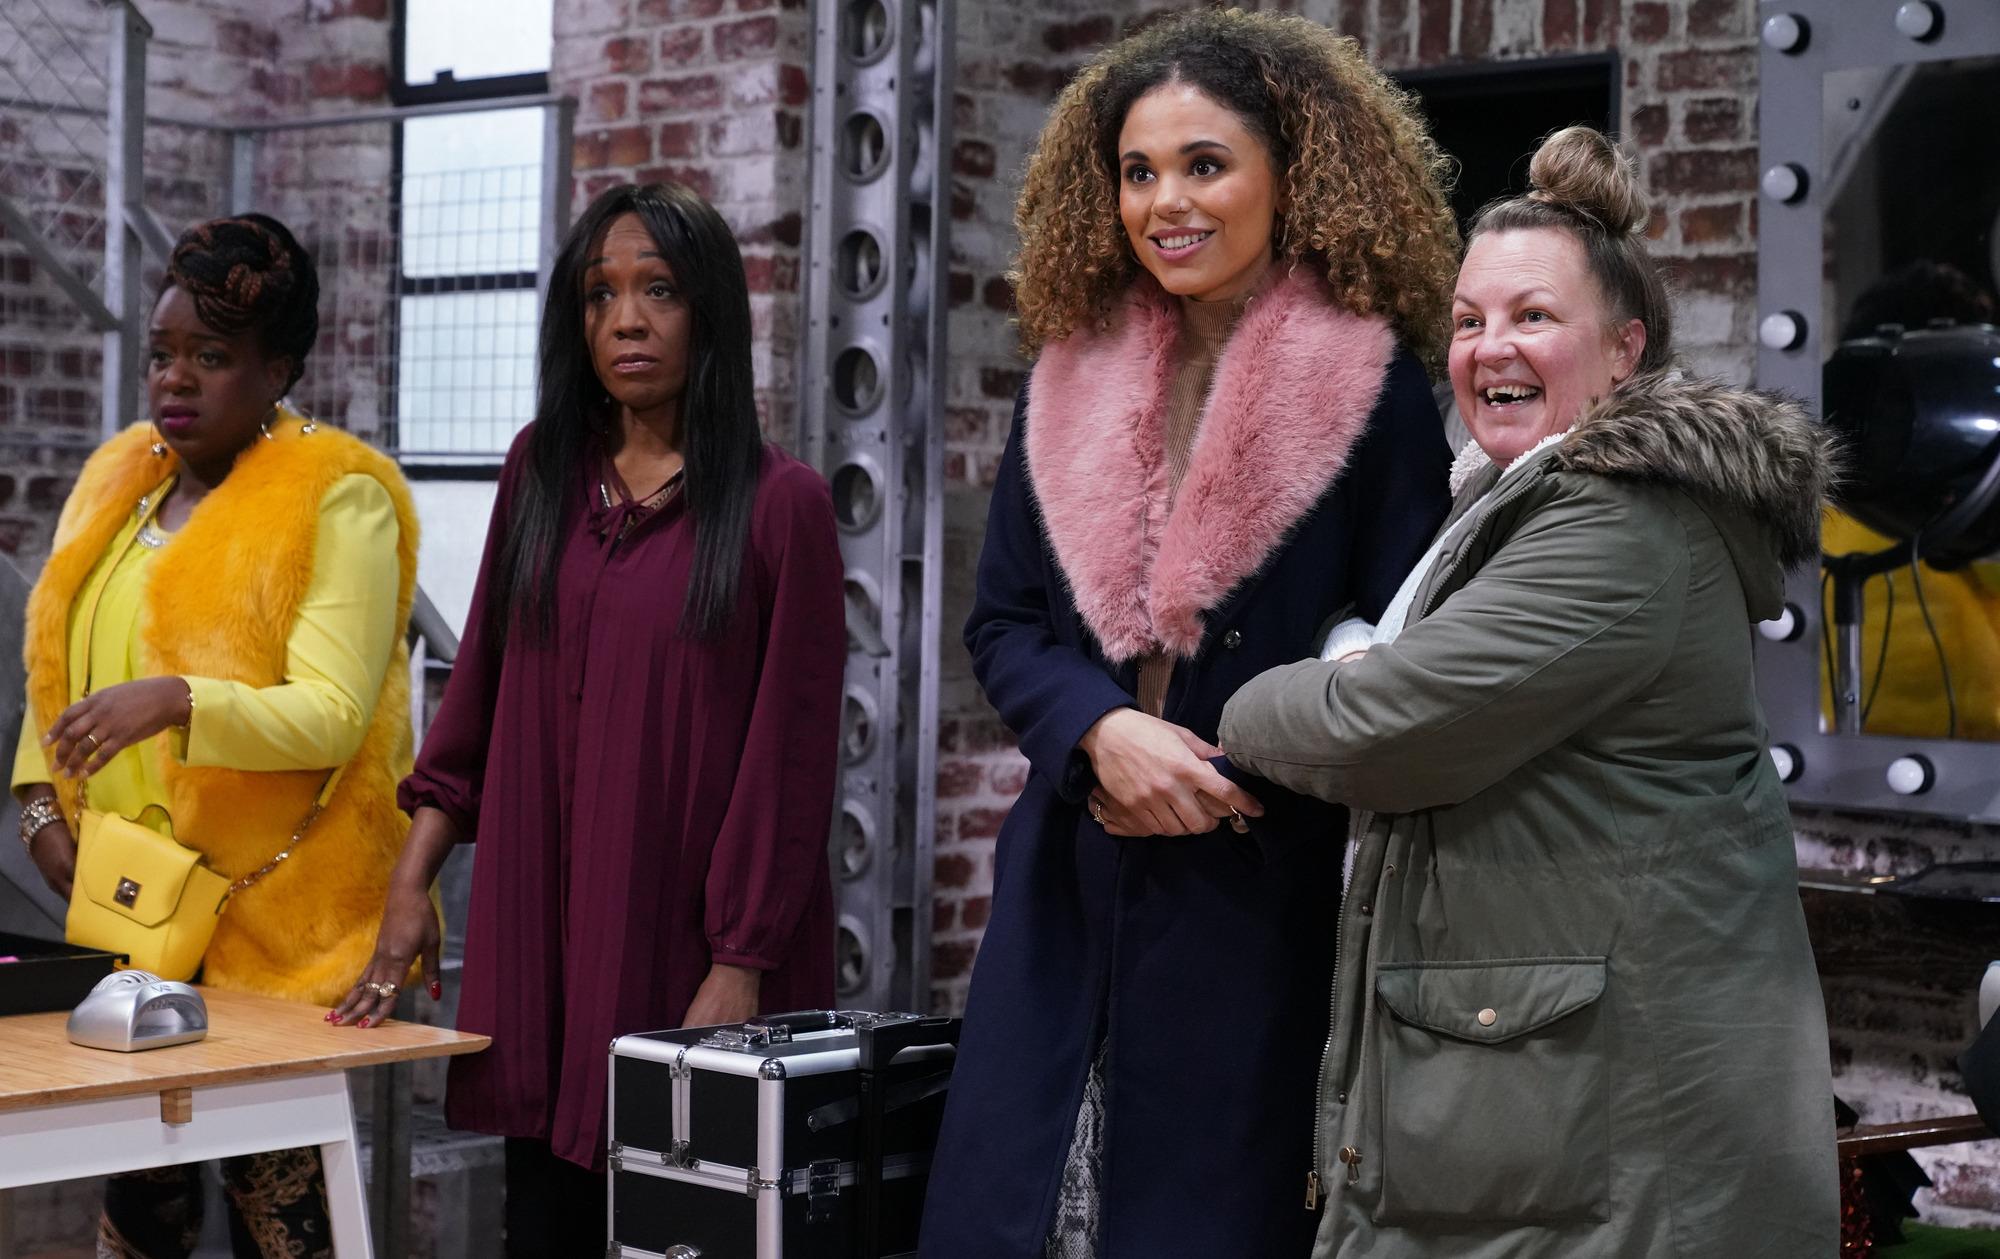 EastEnders spoilers: Chantelle Atkins' arrival story revealed